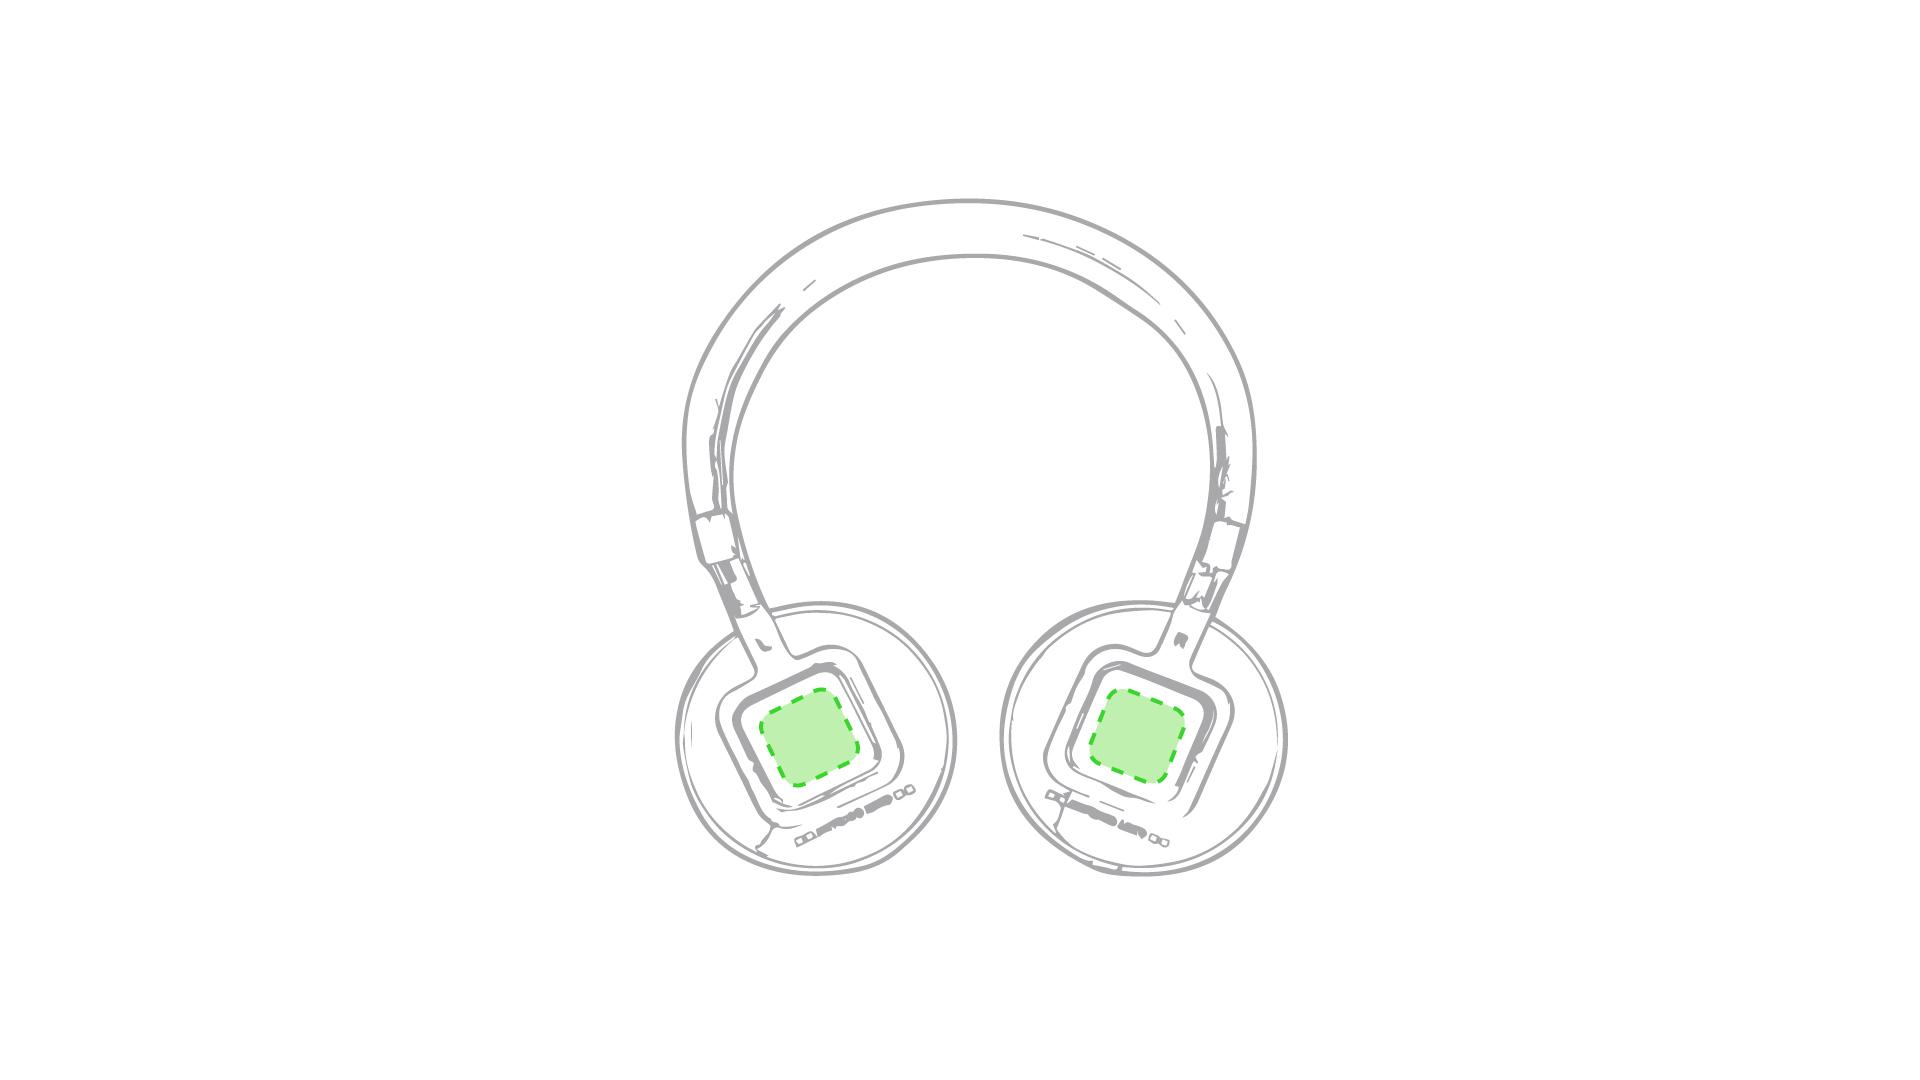 En ambos auriculares